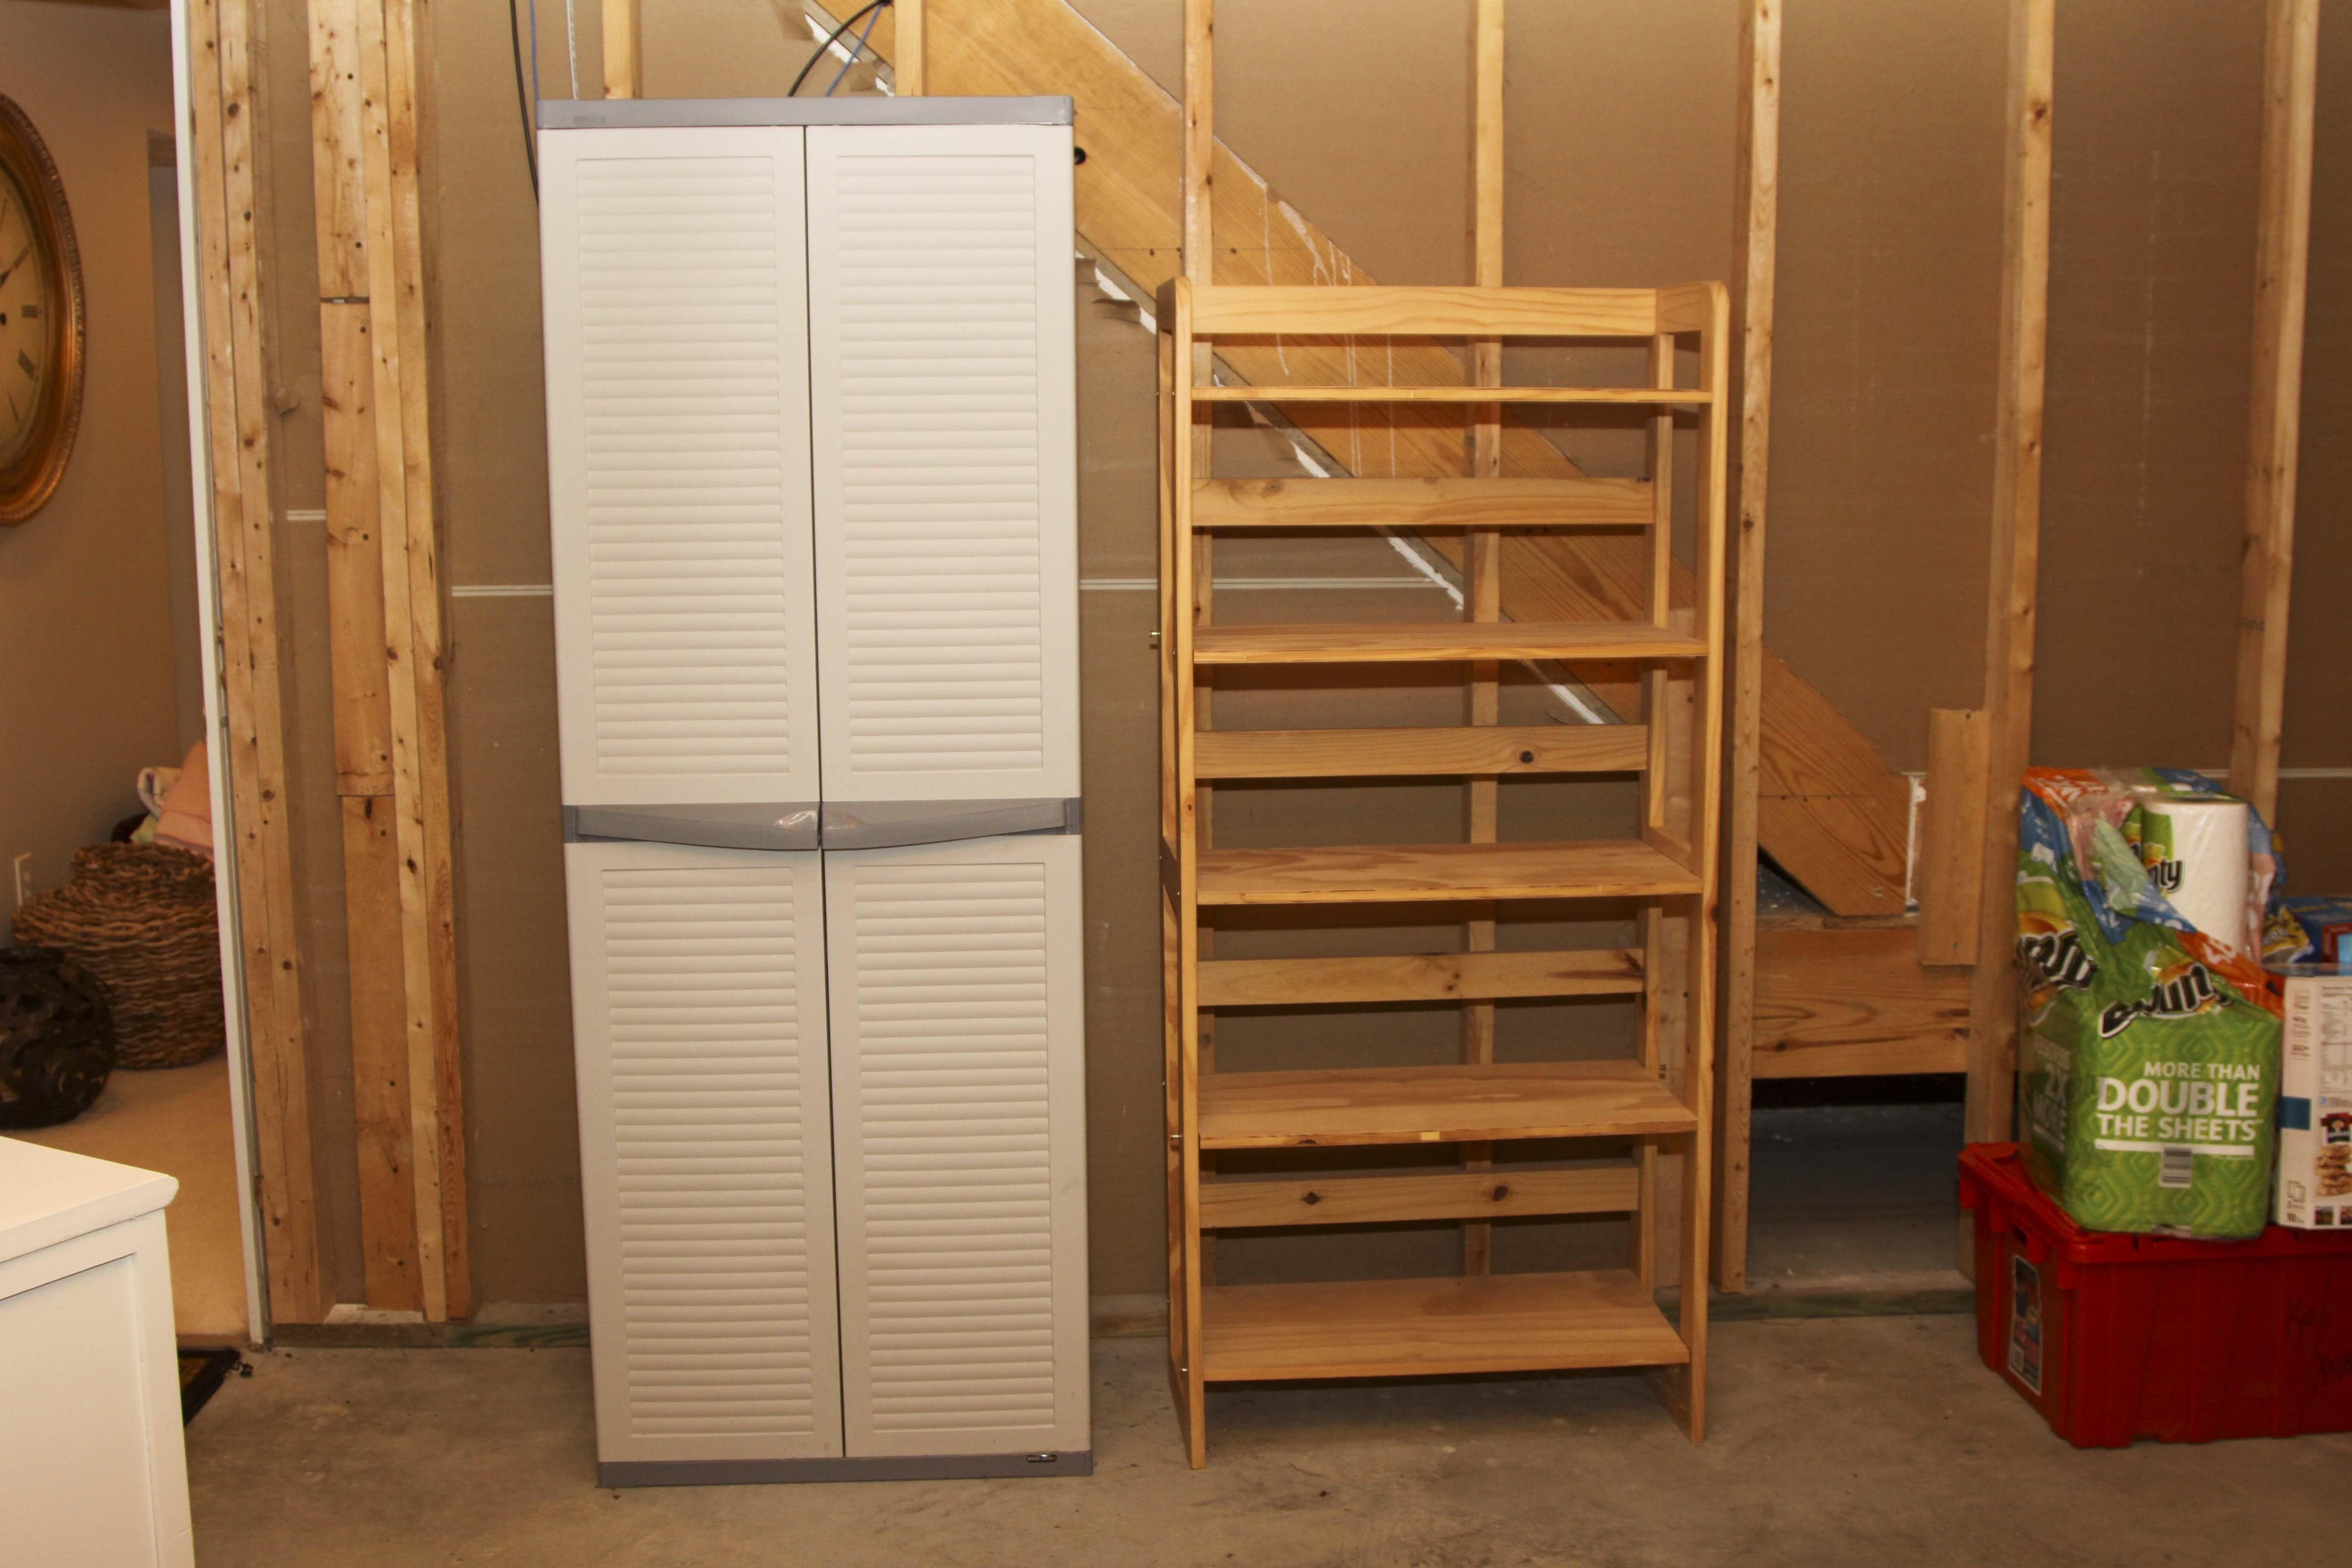 Storage Group